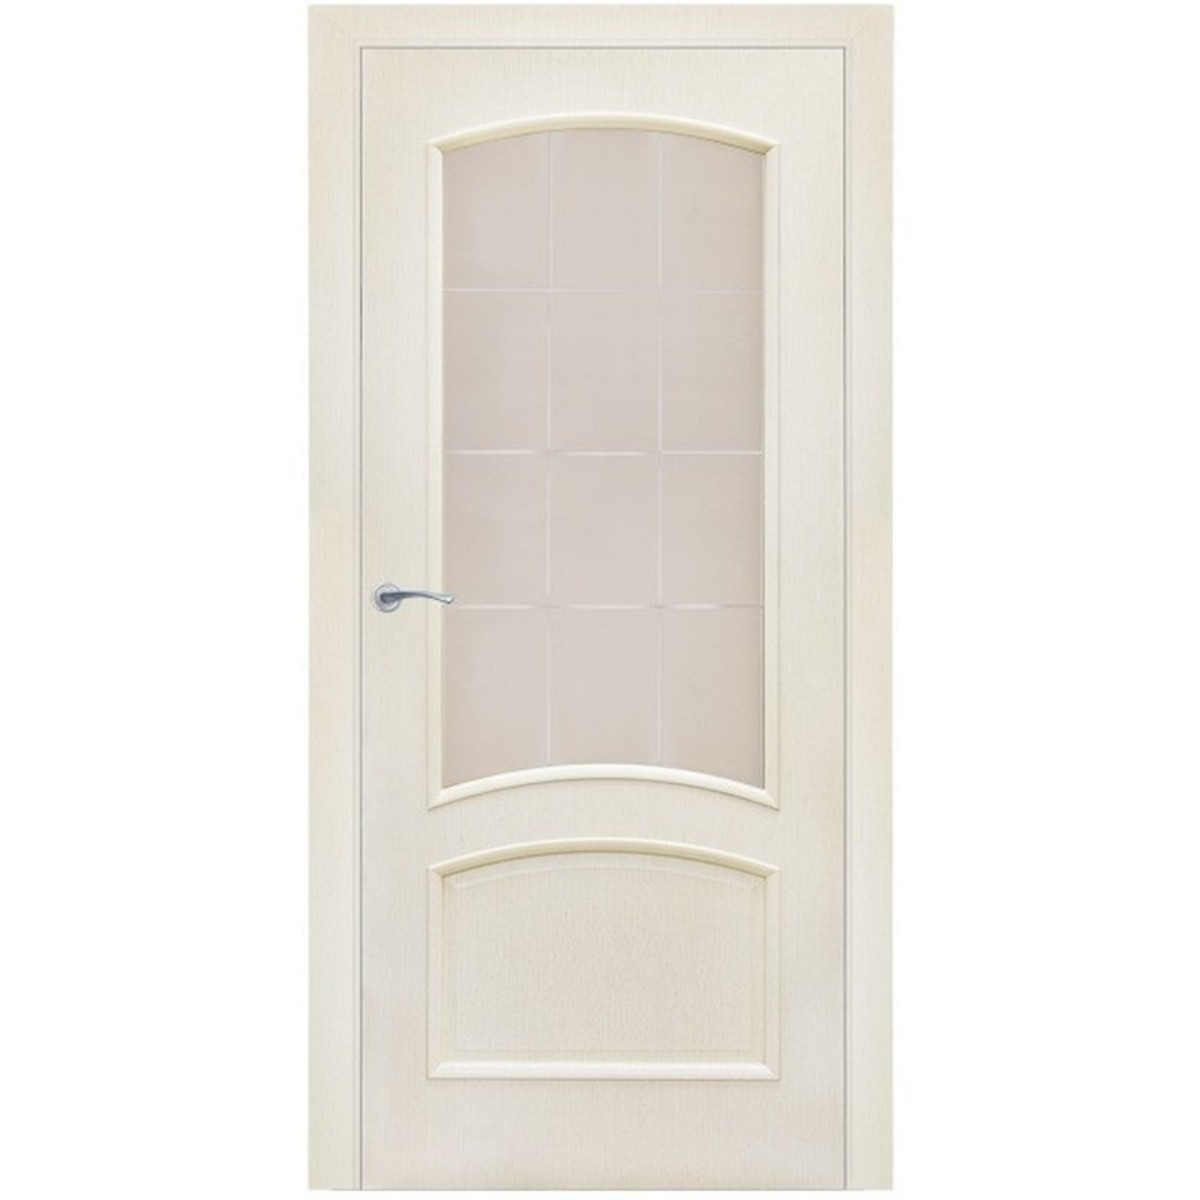 Дверь Межкомнатная Остеклённая Bravo 60x200 Ламинация Цвет Меланж